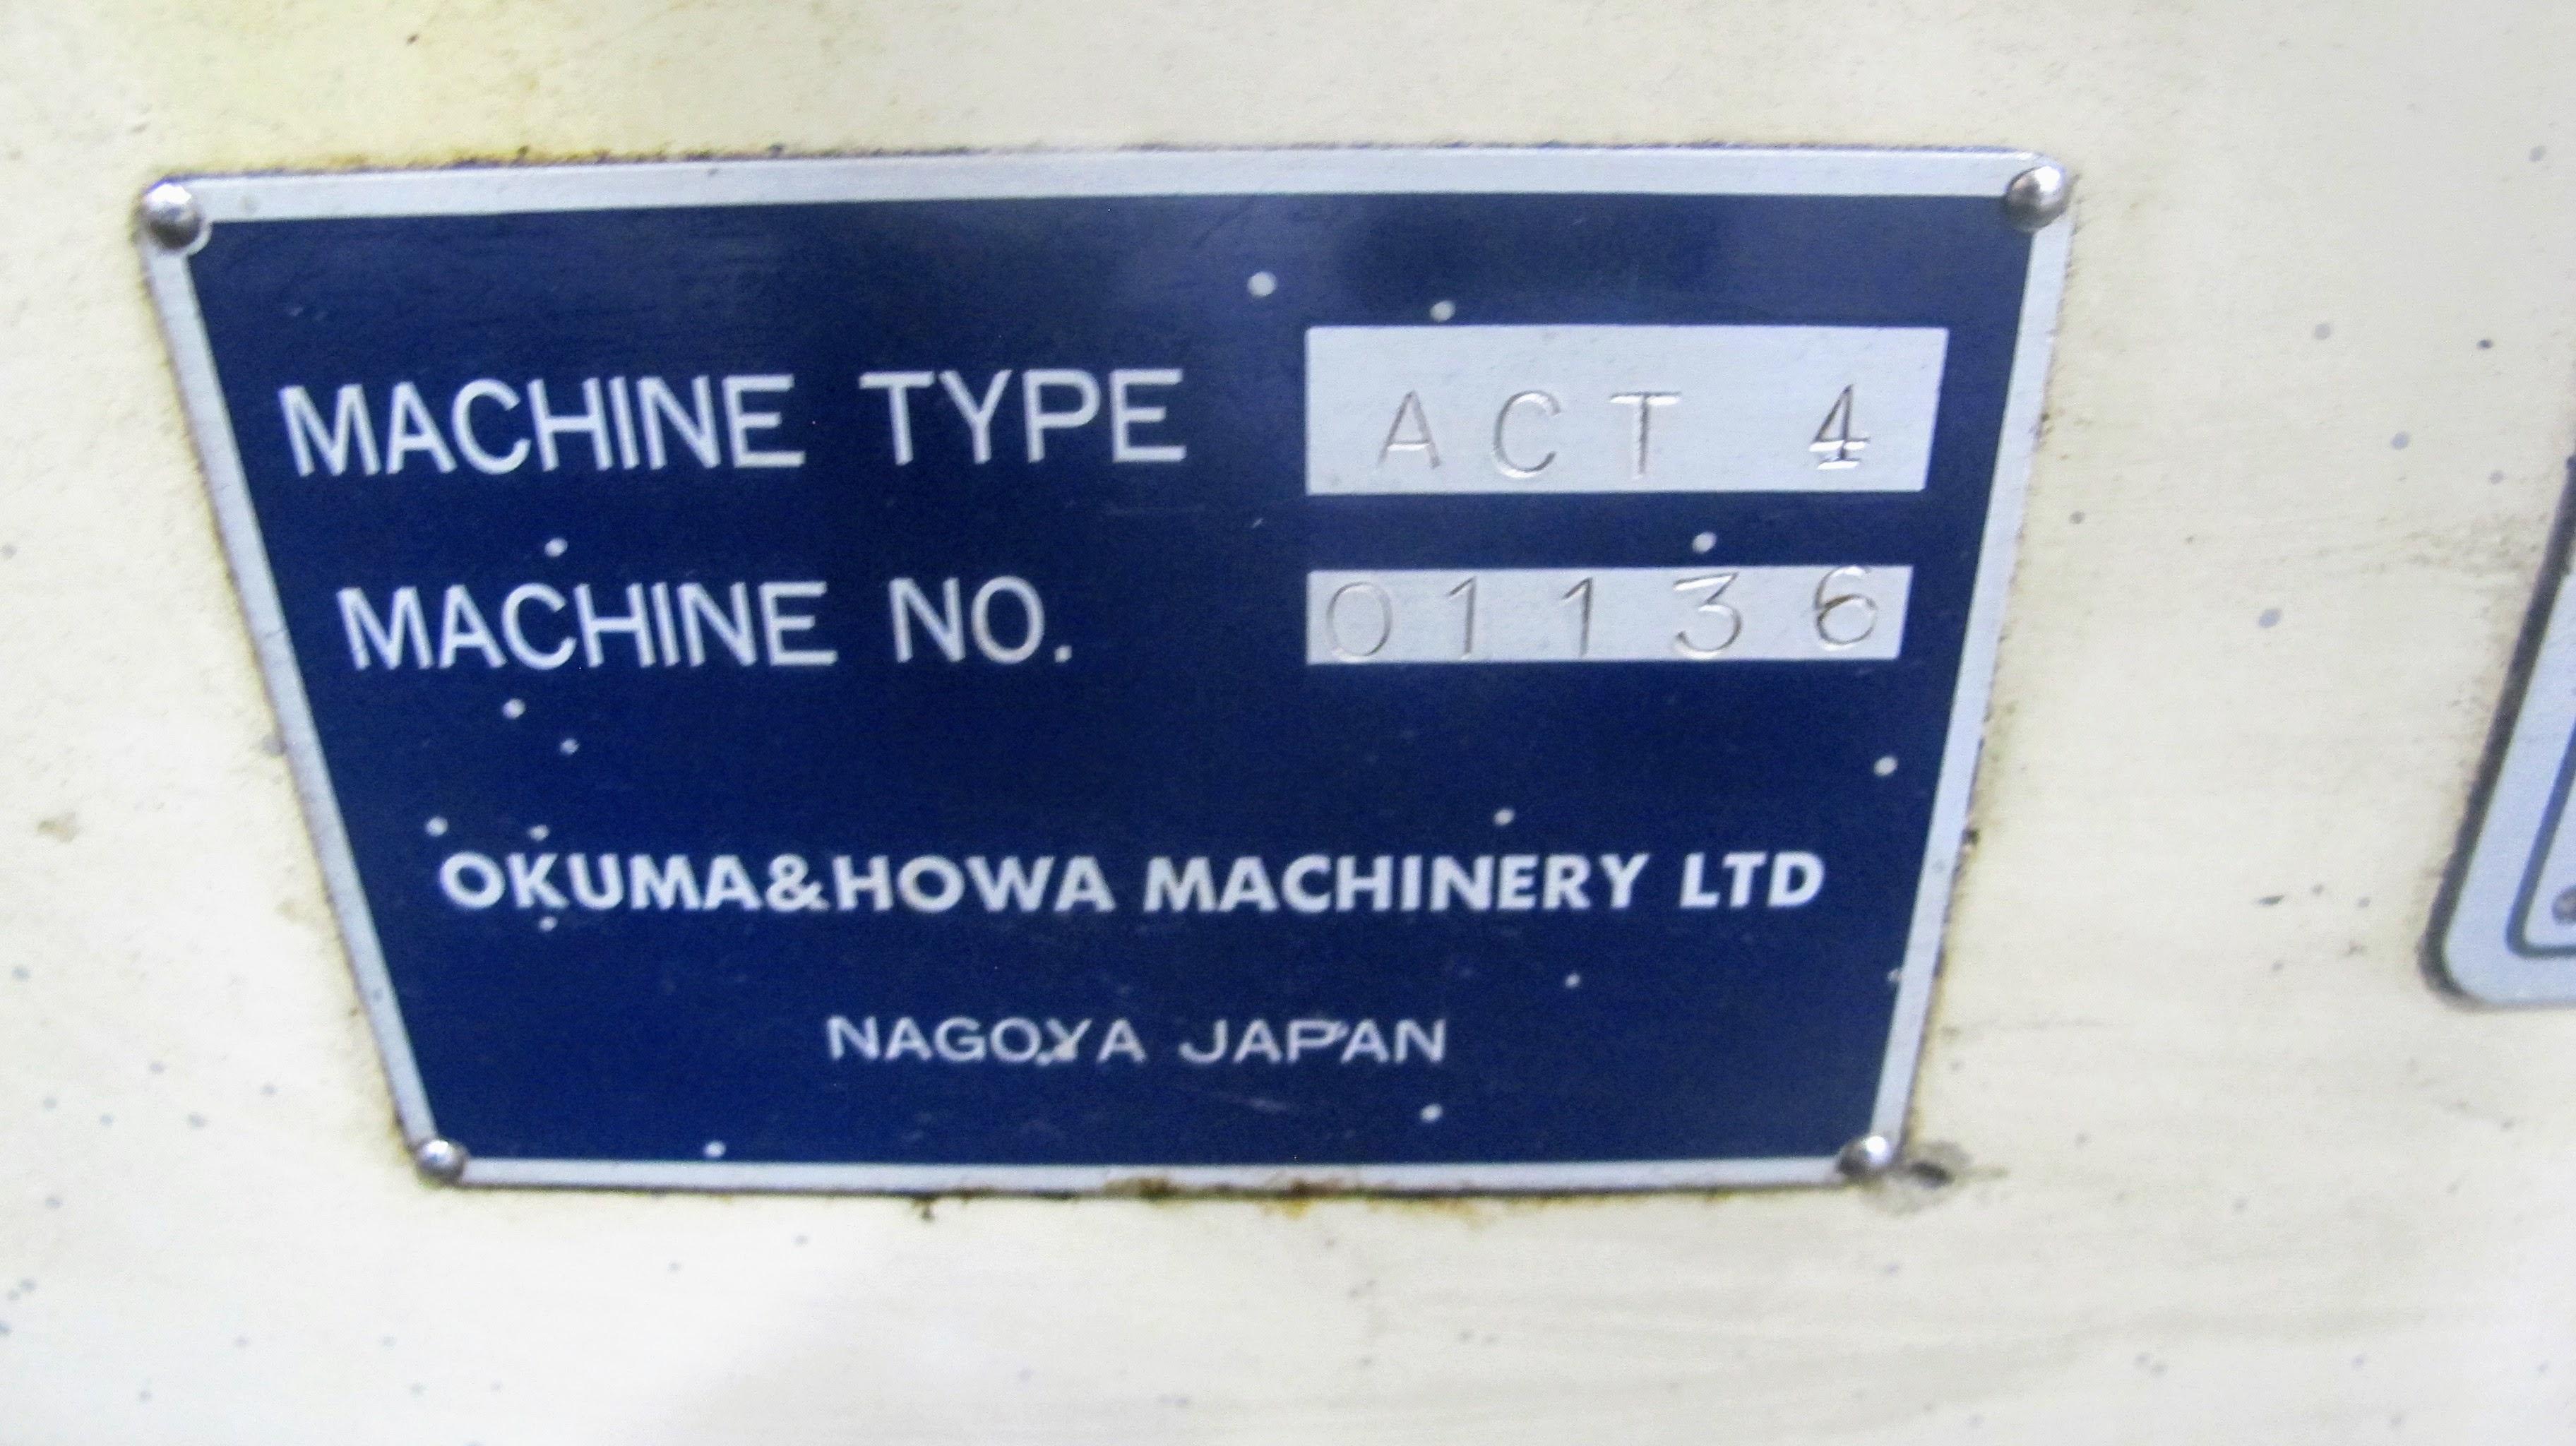 "OKUMA ACT-4 CNC LATHE W/12"" 3 JAW CHUCK, FANUC CONTROL, TAIL STOCK, ATC-12 W/10 TOOL HOLDERS, - Image 17 of 17"